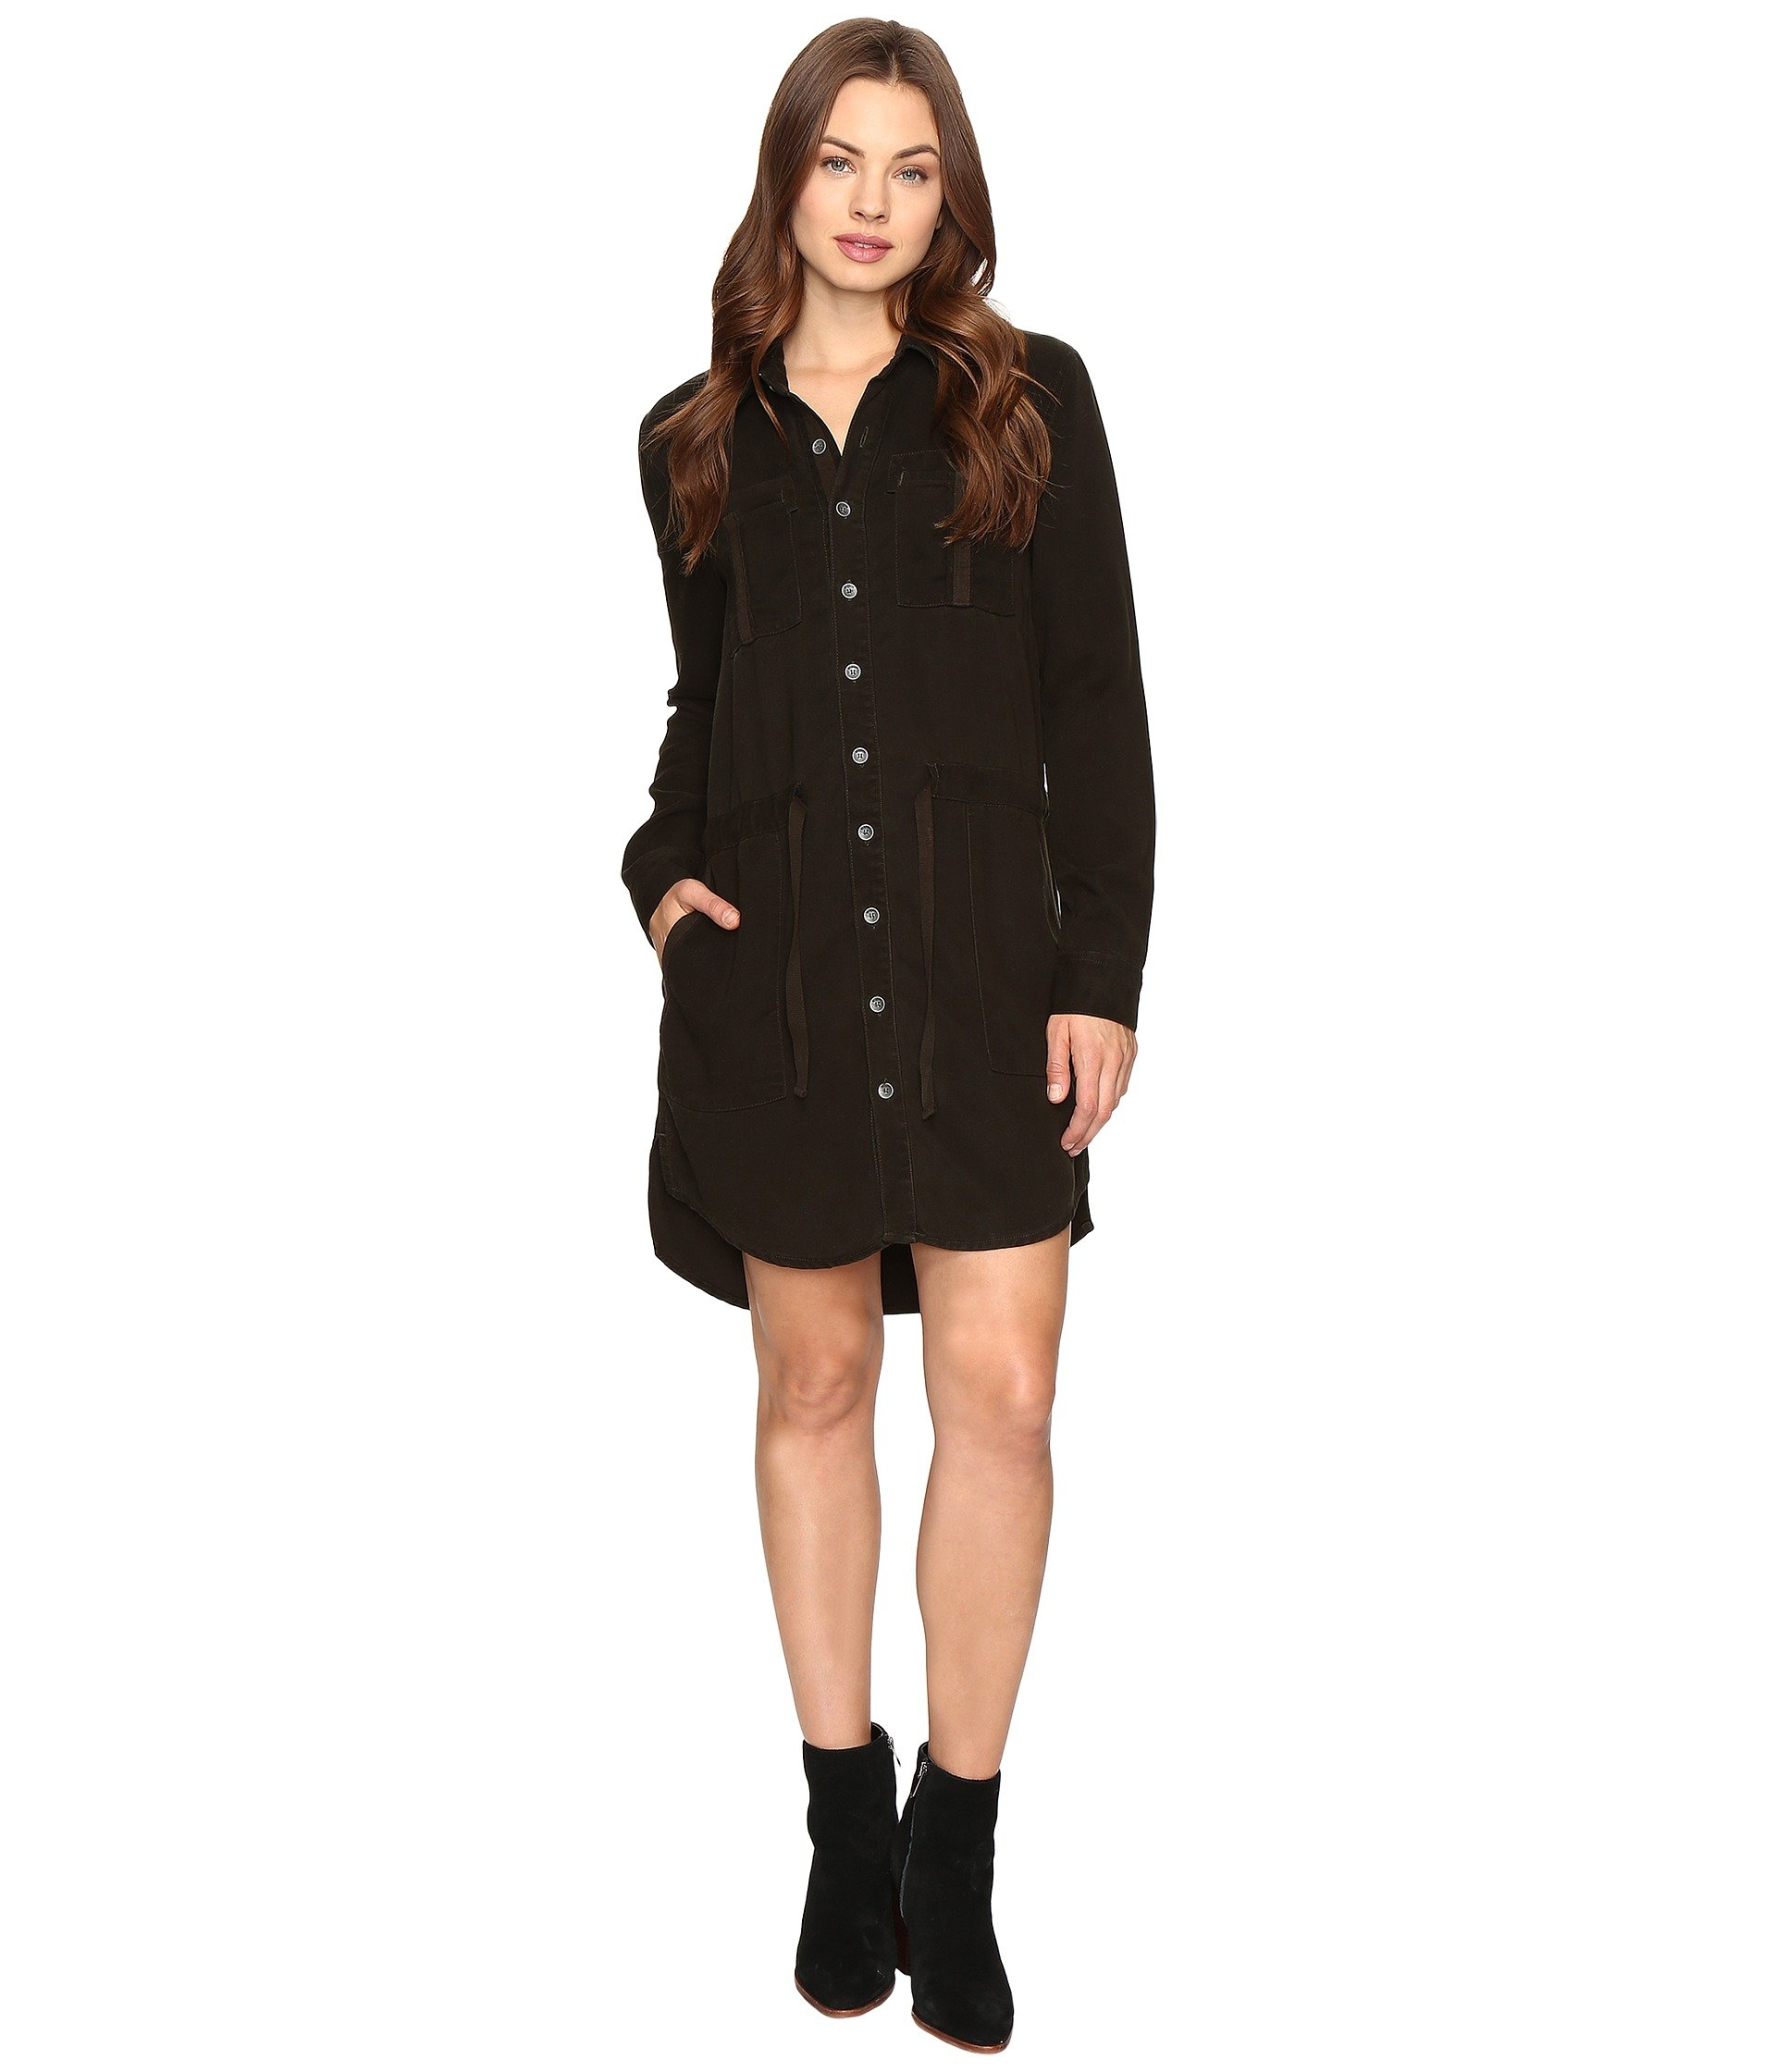 Peyton Military Shirt Dress - Unrestrained Black